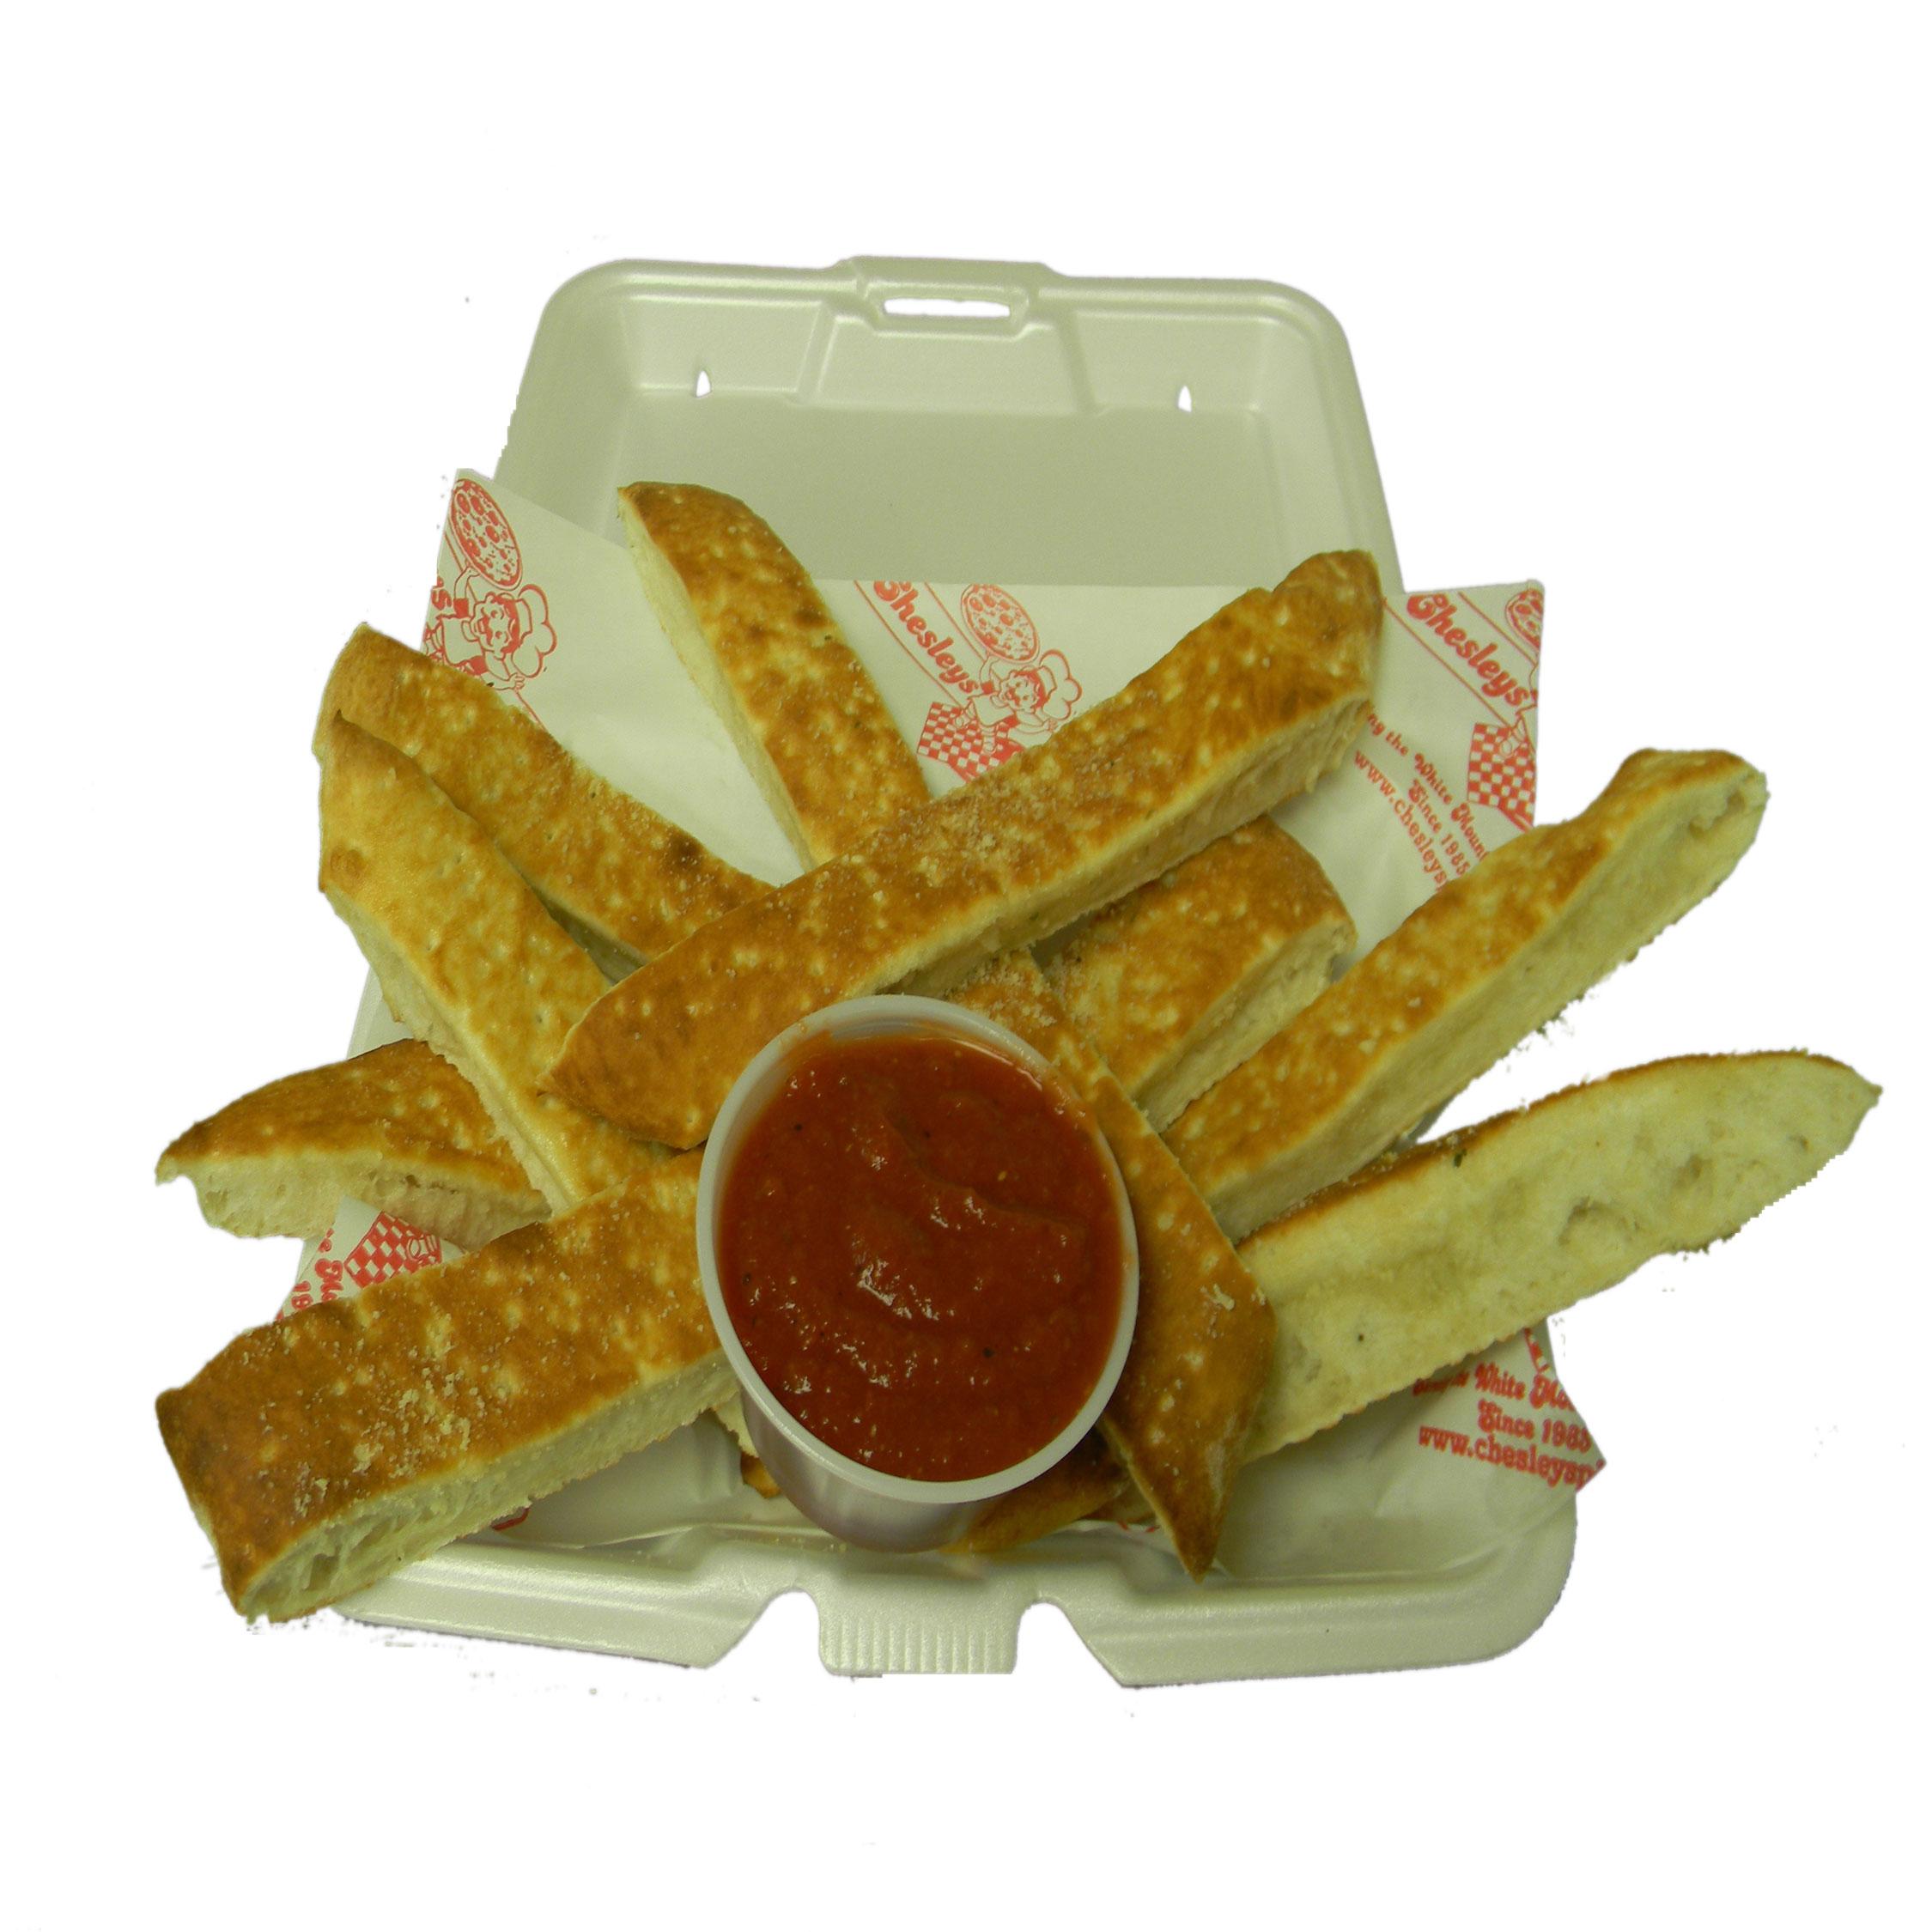 Breadsticks Image